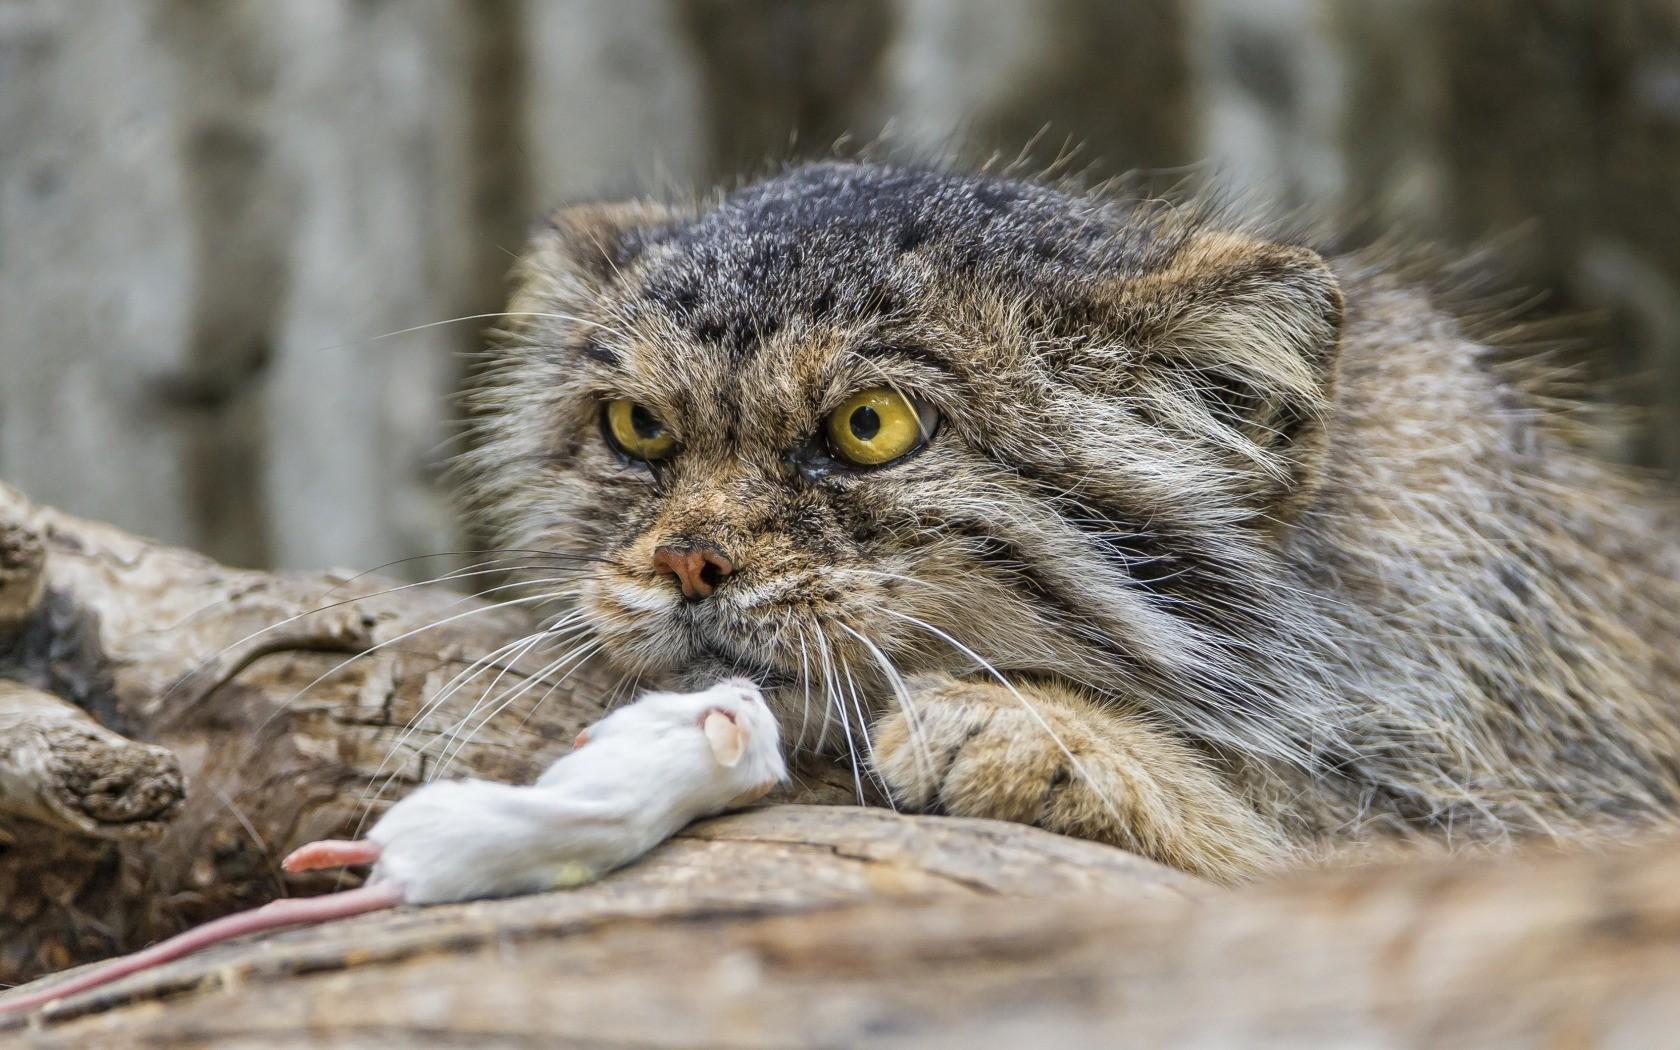 General 1680x1050 animals Pallas's Cat cats mammals big cats yellow eyes animal eyes mice dead food